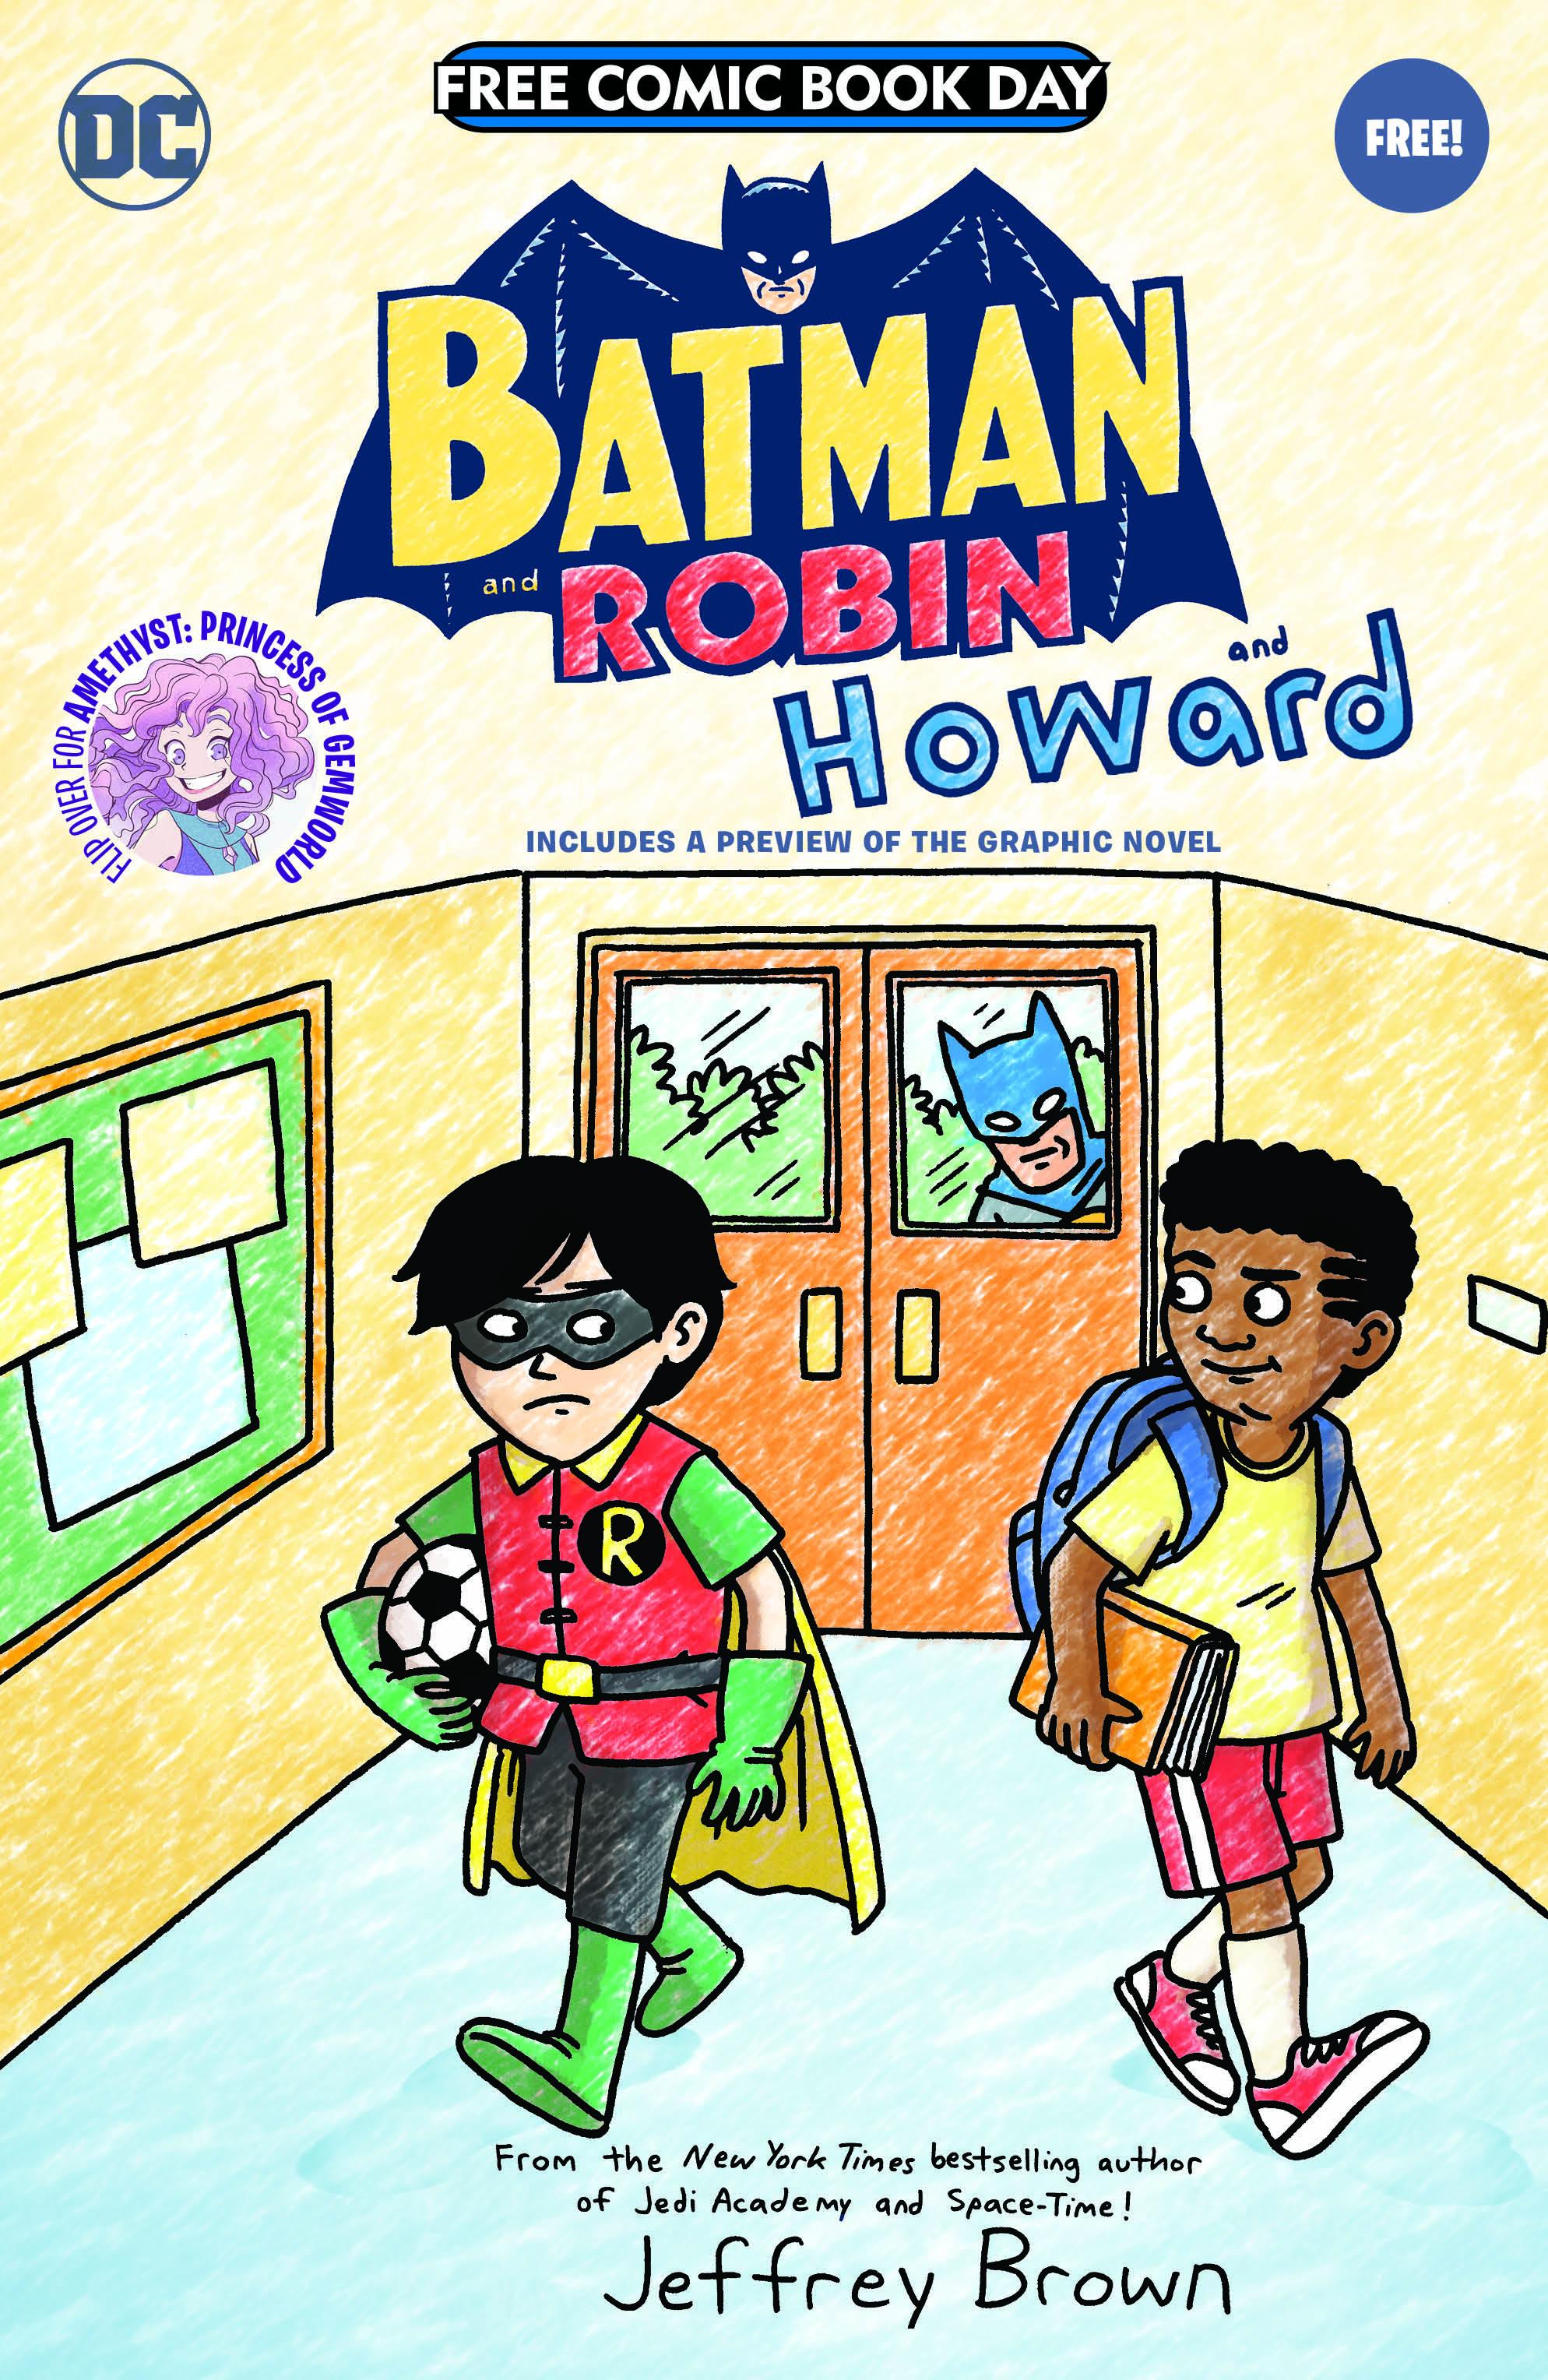 BATMAN & ROBIN AND HOWARD / AMETHYST: PRINCESS OF GEMWORLD SPECIAL EDITION FLIPBOOK